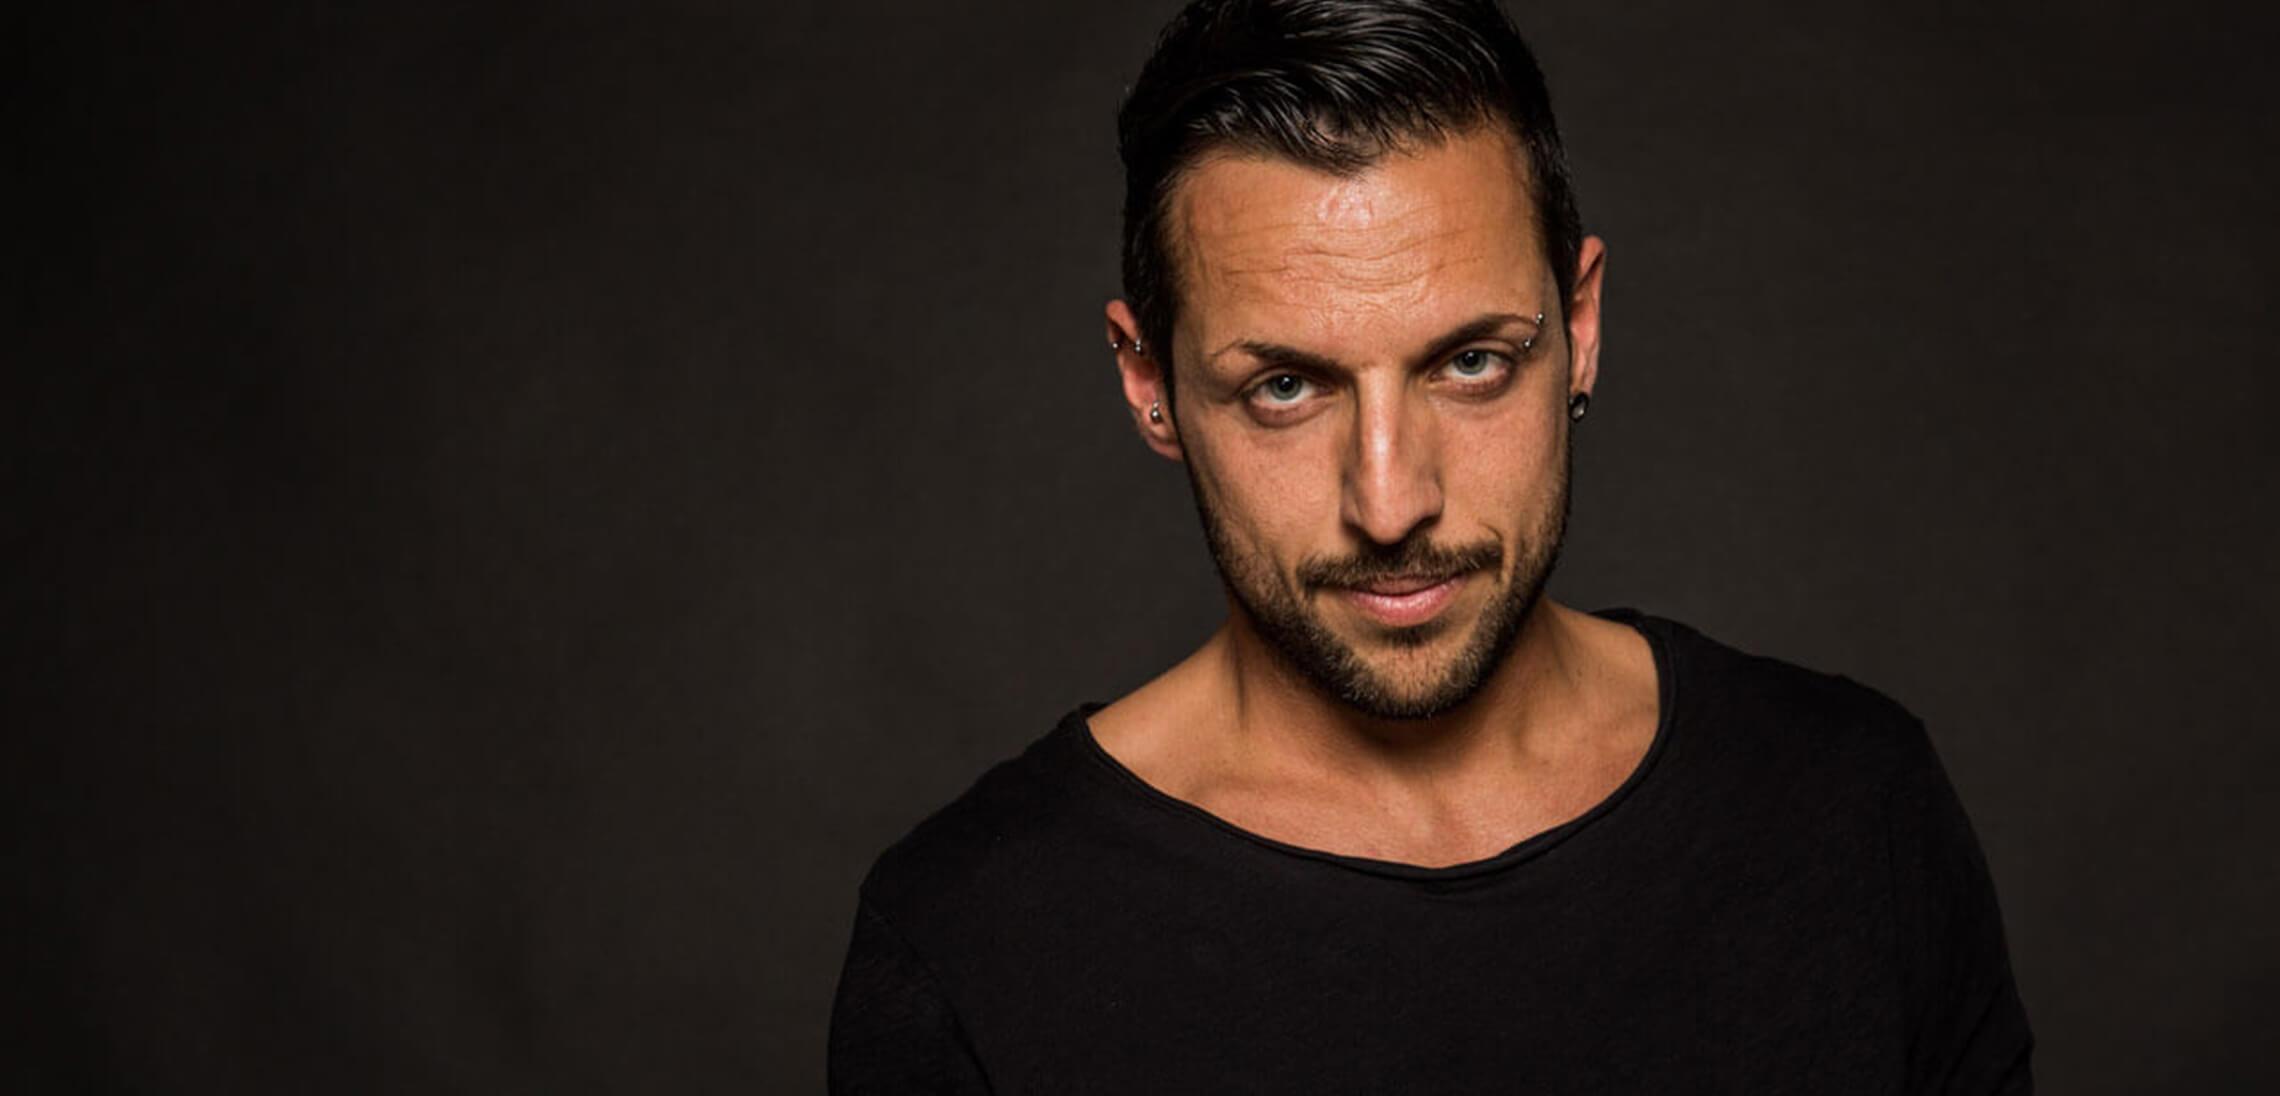 Fabio Neural & DJ Fronter - Bumble hero